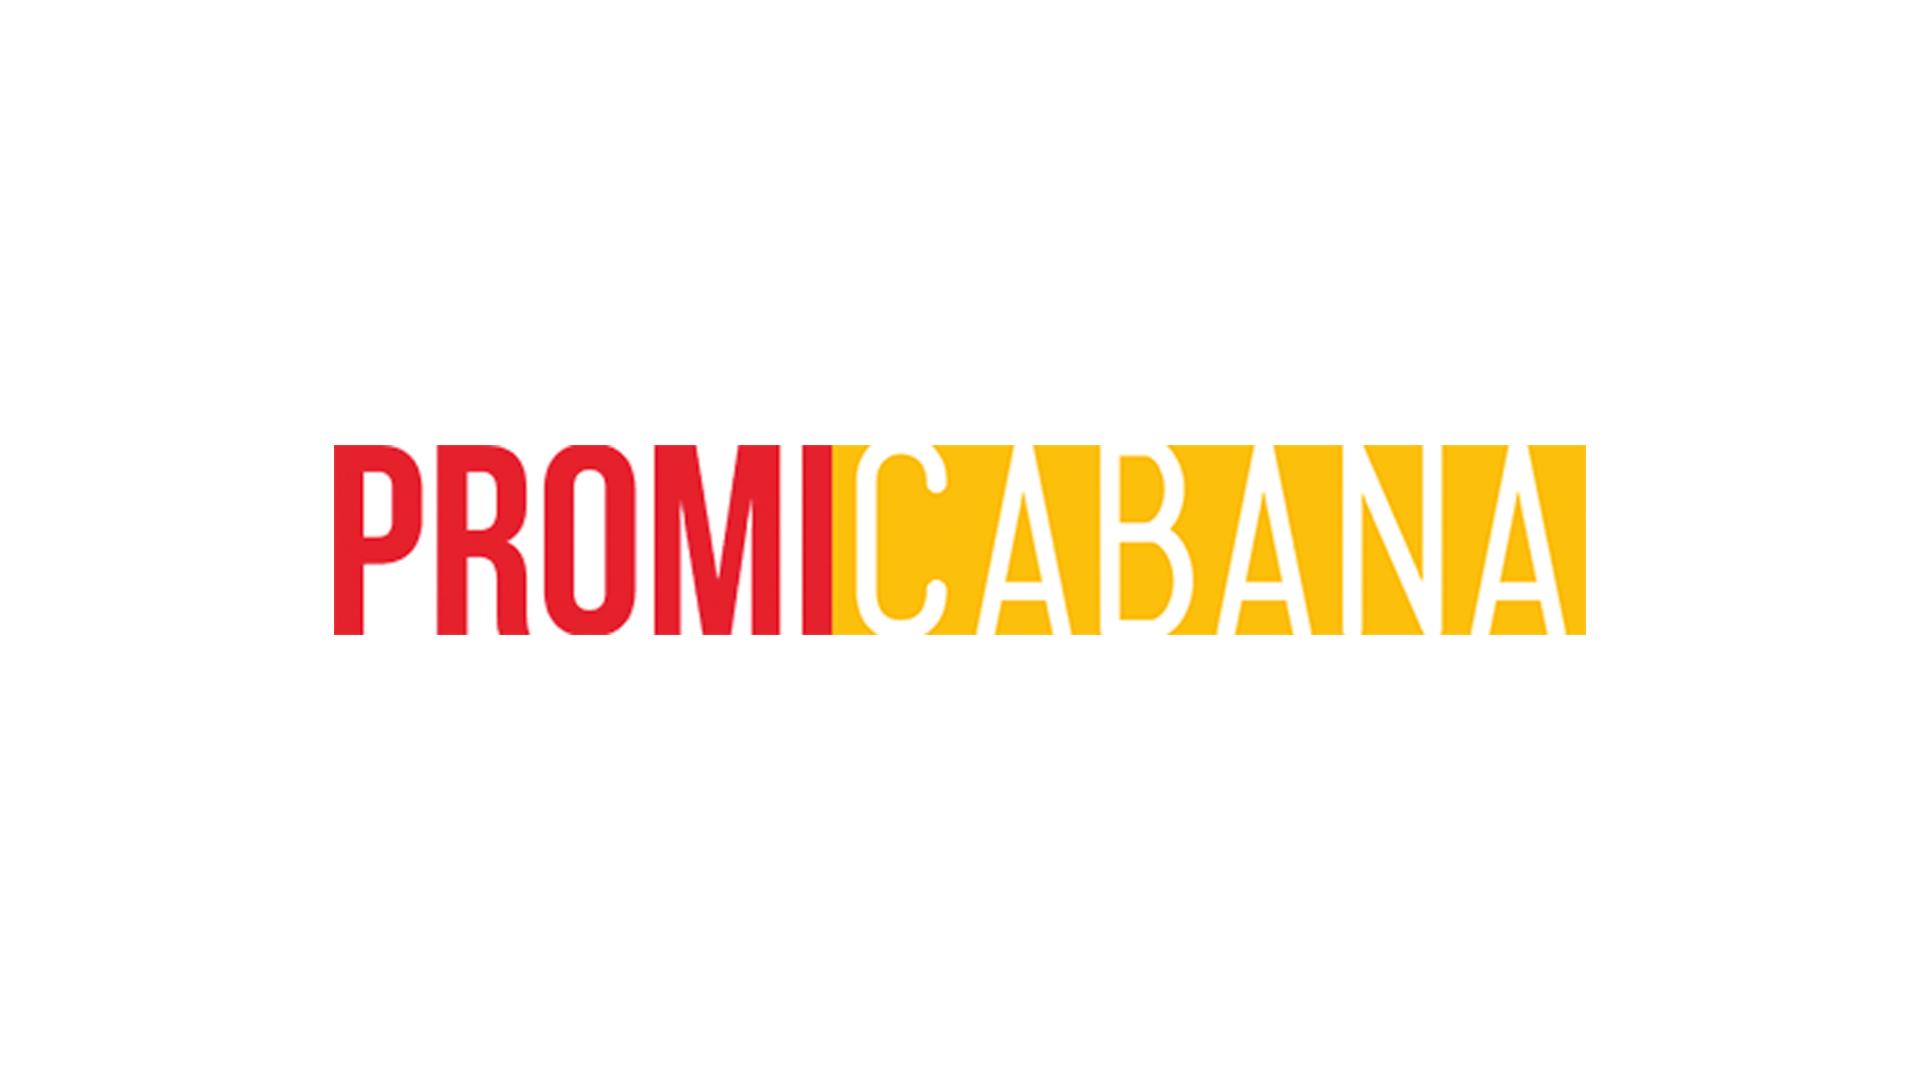 Christina-Grimmie-Familie